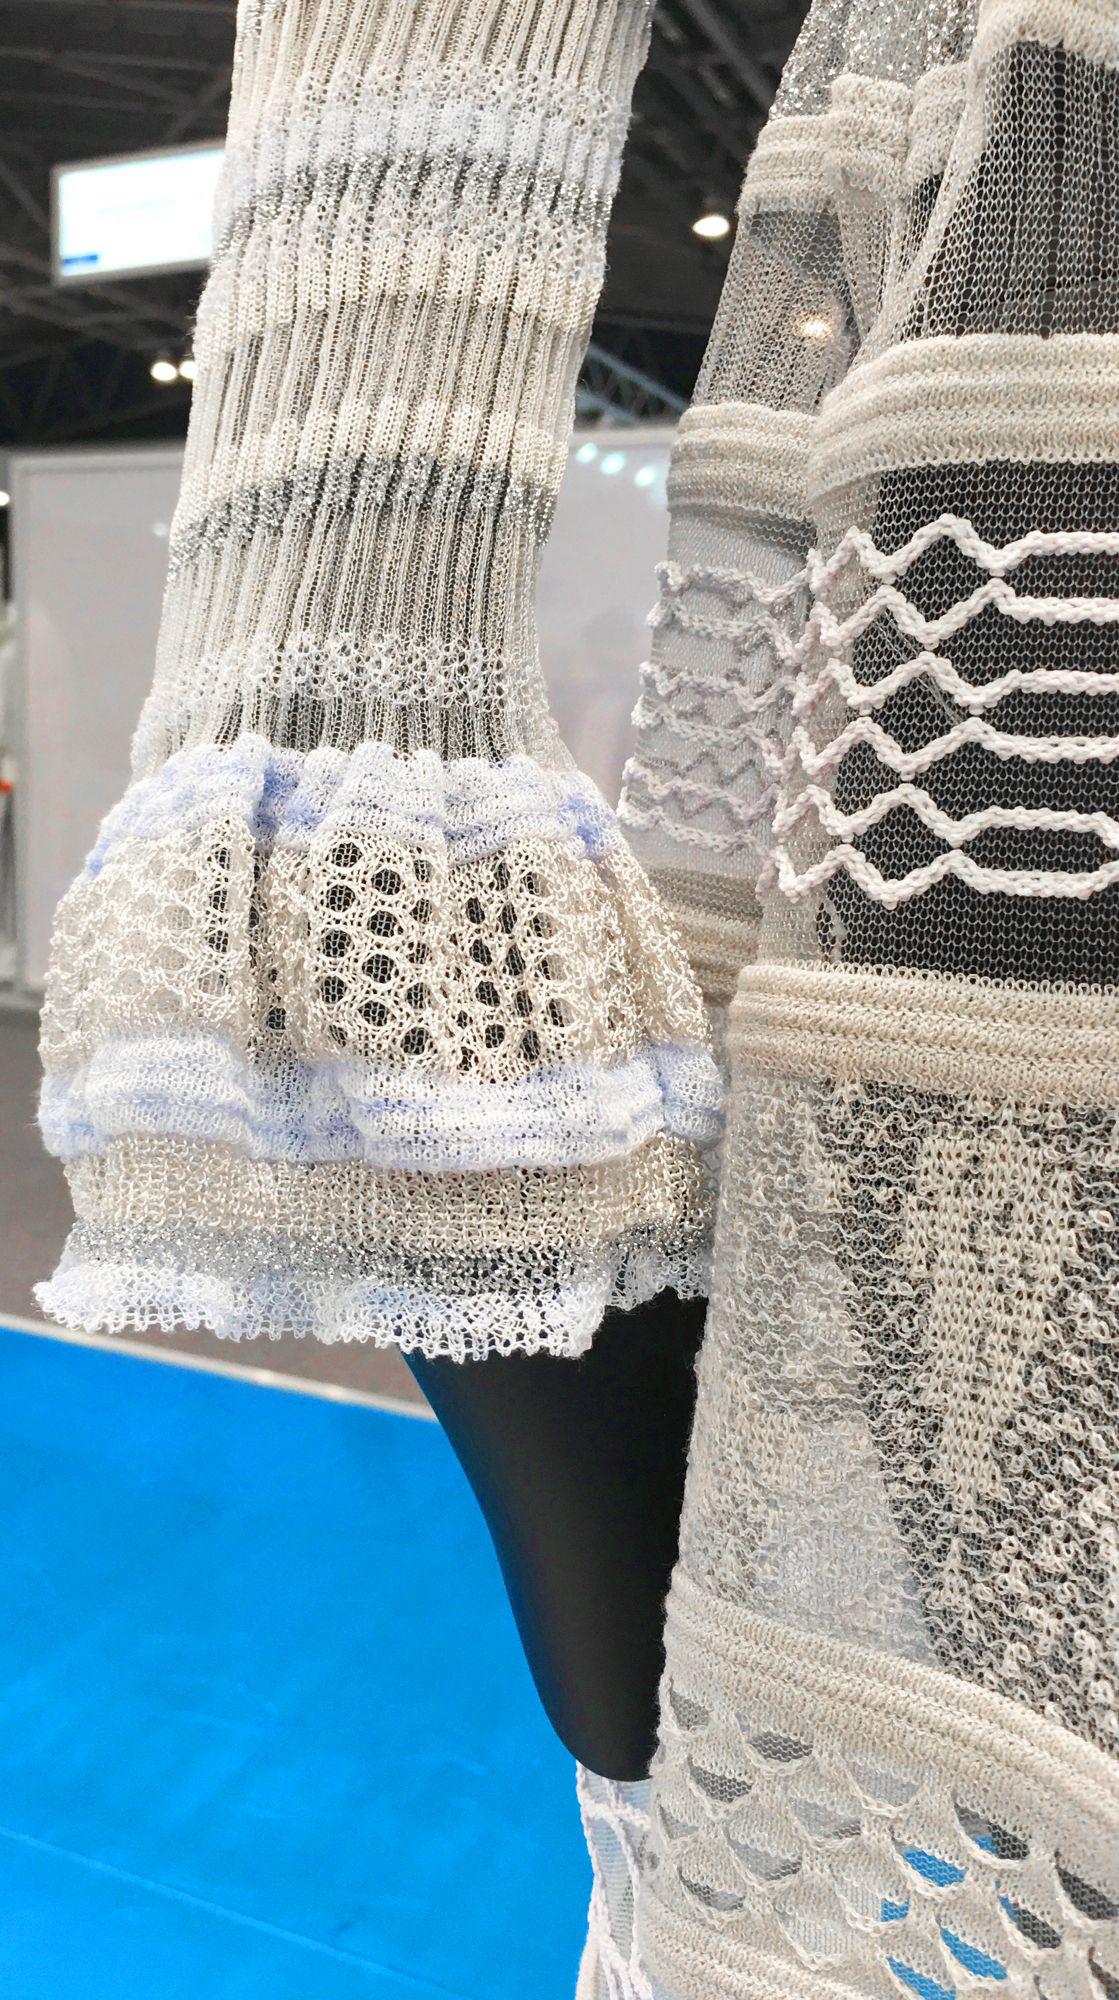 SHANGHAI SPINEXPO 2017 SPRING SUMMER    #spinexpo  #spinexpo2017  #yarndesign  #fabricdesign  #knitwear  #knitweardesign  #knitdesign  #fashiondesign  #knitfashion  #yarn  #fabric #pattern  #patterndesign  #knitwearpattern  #stitches  #knitstitches  #sweaterdesign  #sweaterpattern  #sweaterfashion  #yarns  #pointelle  #texture  #texturedesign  #fashiontexture  #knittexture  #knitting  #fashiondetails  #fashiondetail  #knitdetails  #fabrics